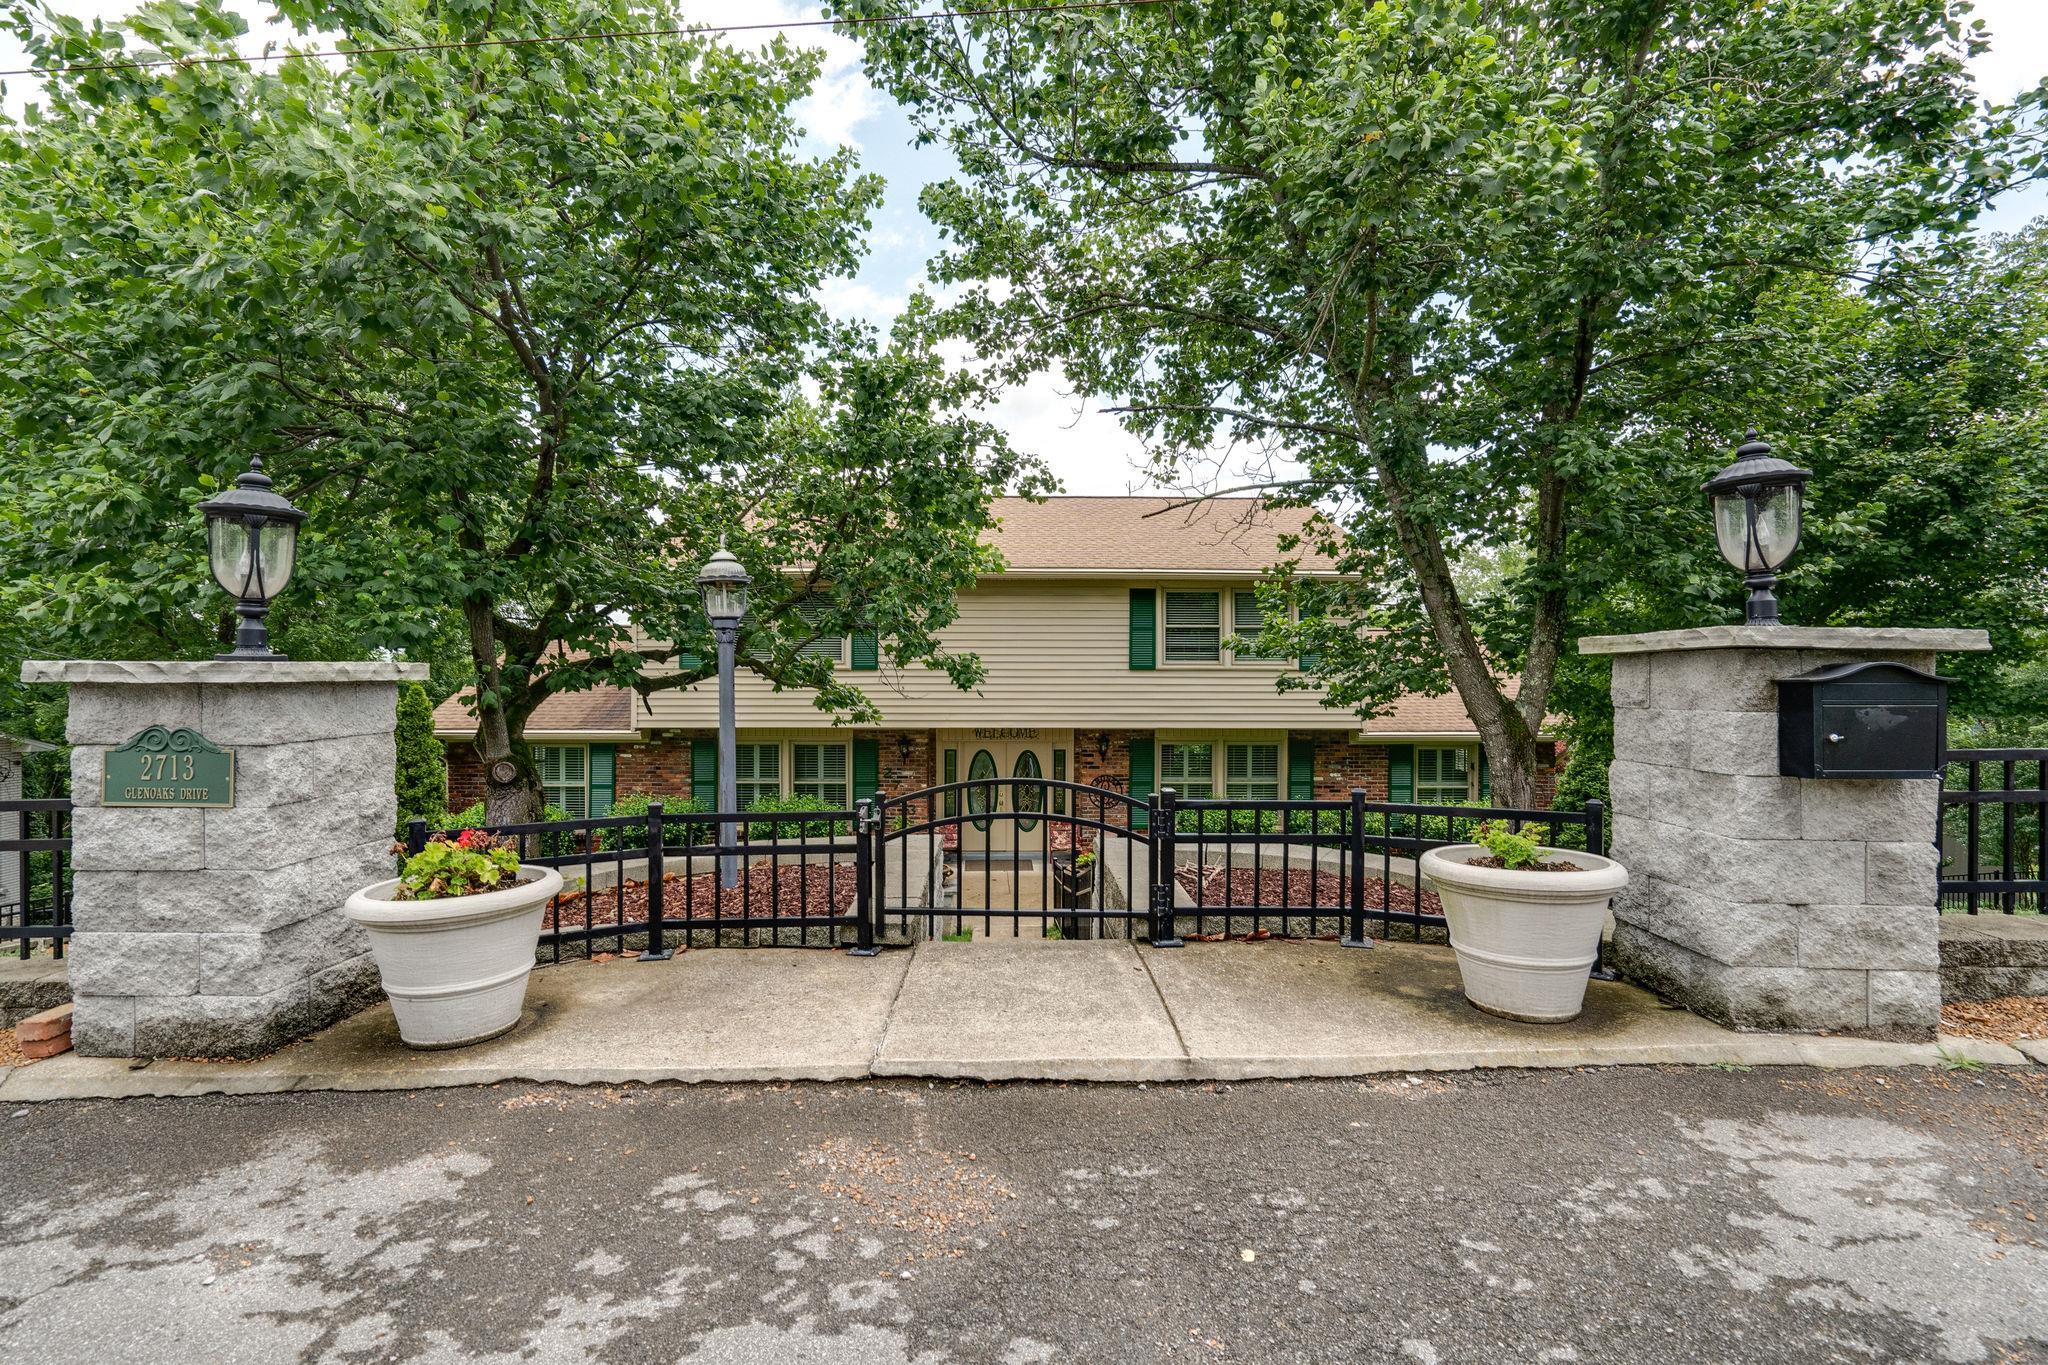 2713 Glenoaks Dr, Nashville, TN 37214 - Nashville, TN real estate listing